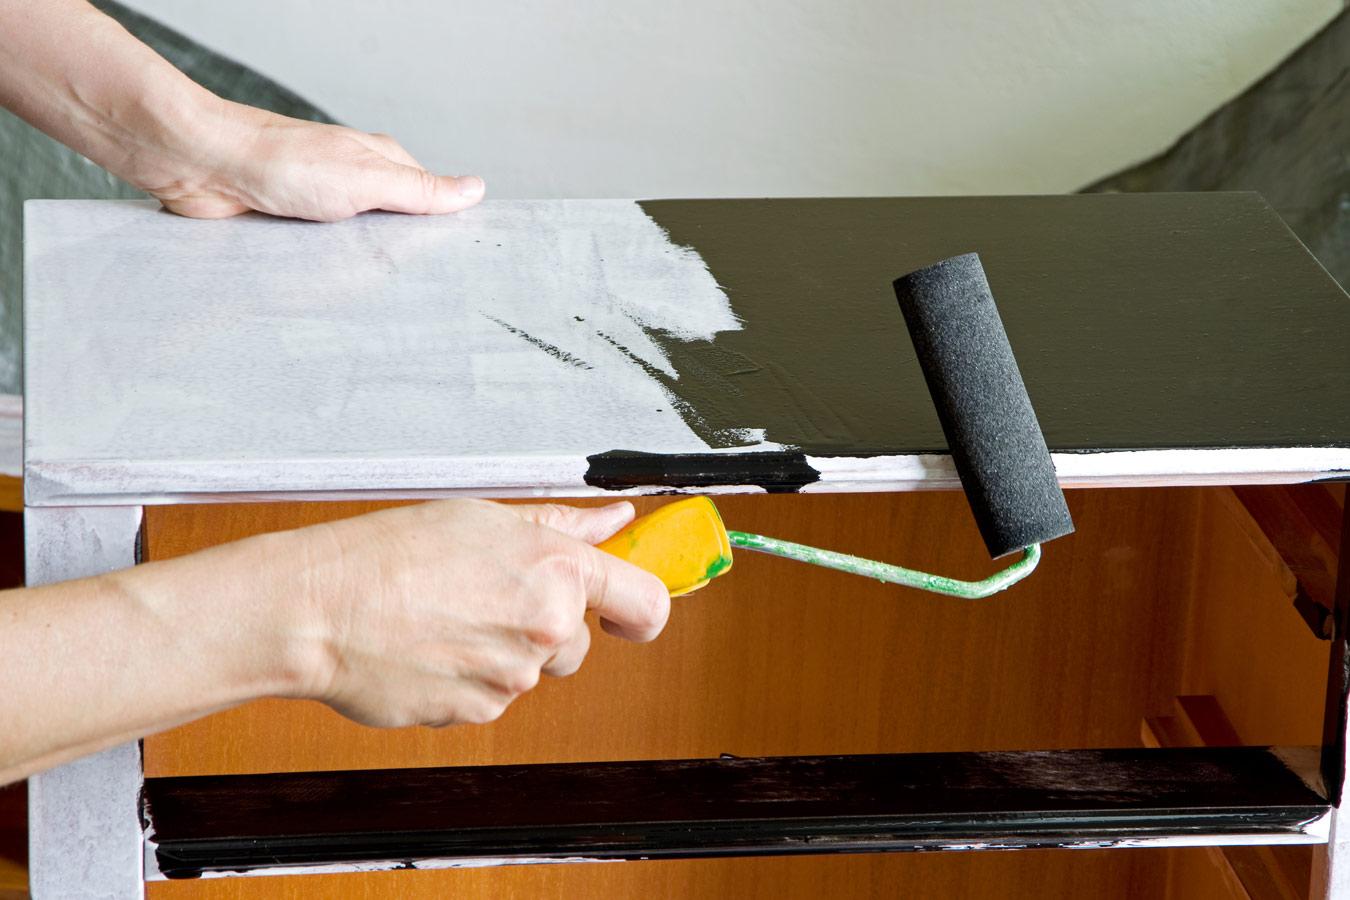 Keukenkasten schilderen: stappenplan en kleuren